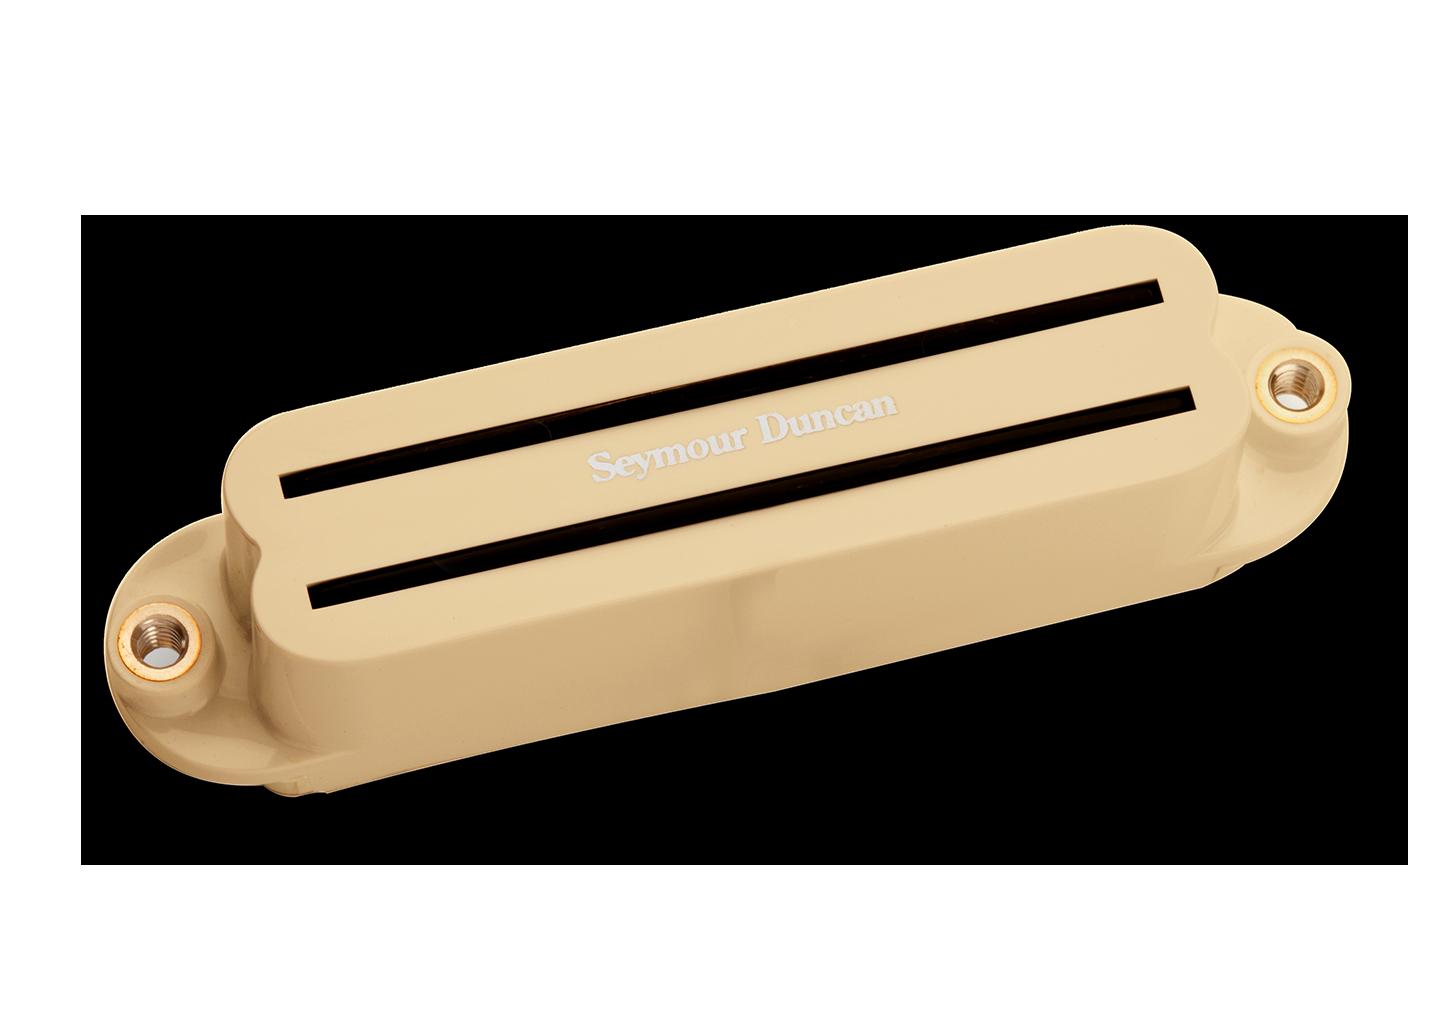 Seymour Duncan Cool Rails Strat SCR-1N Neck Cream